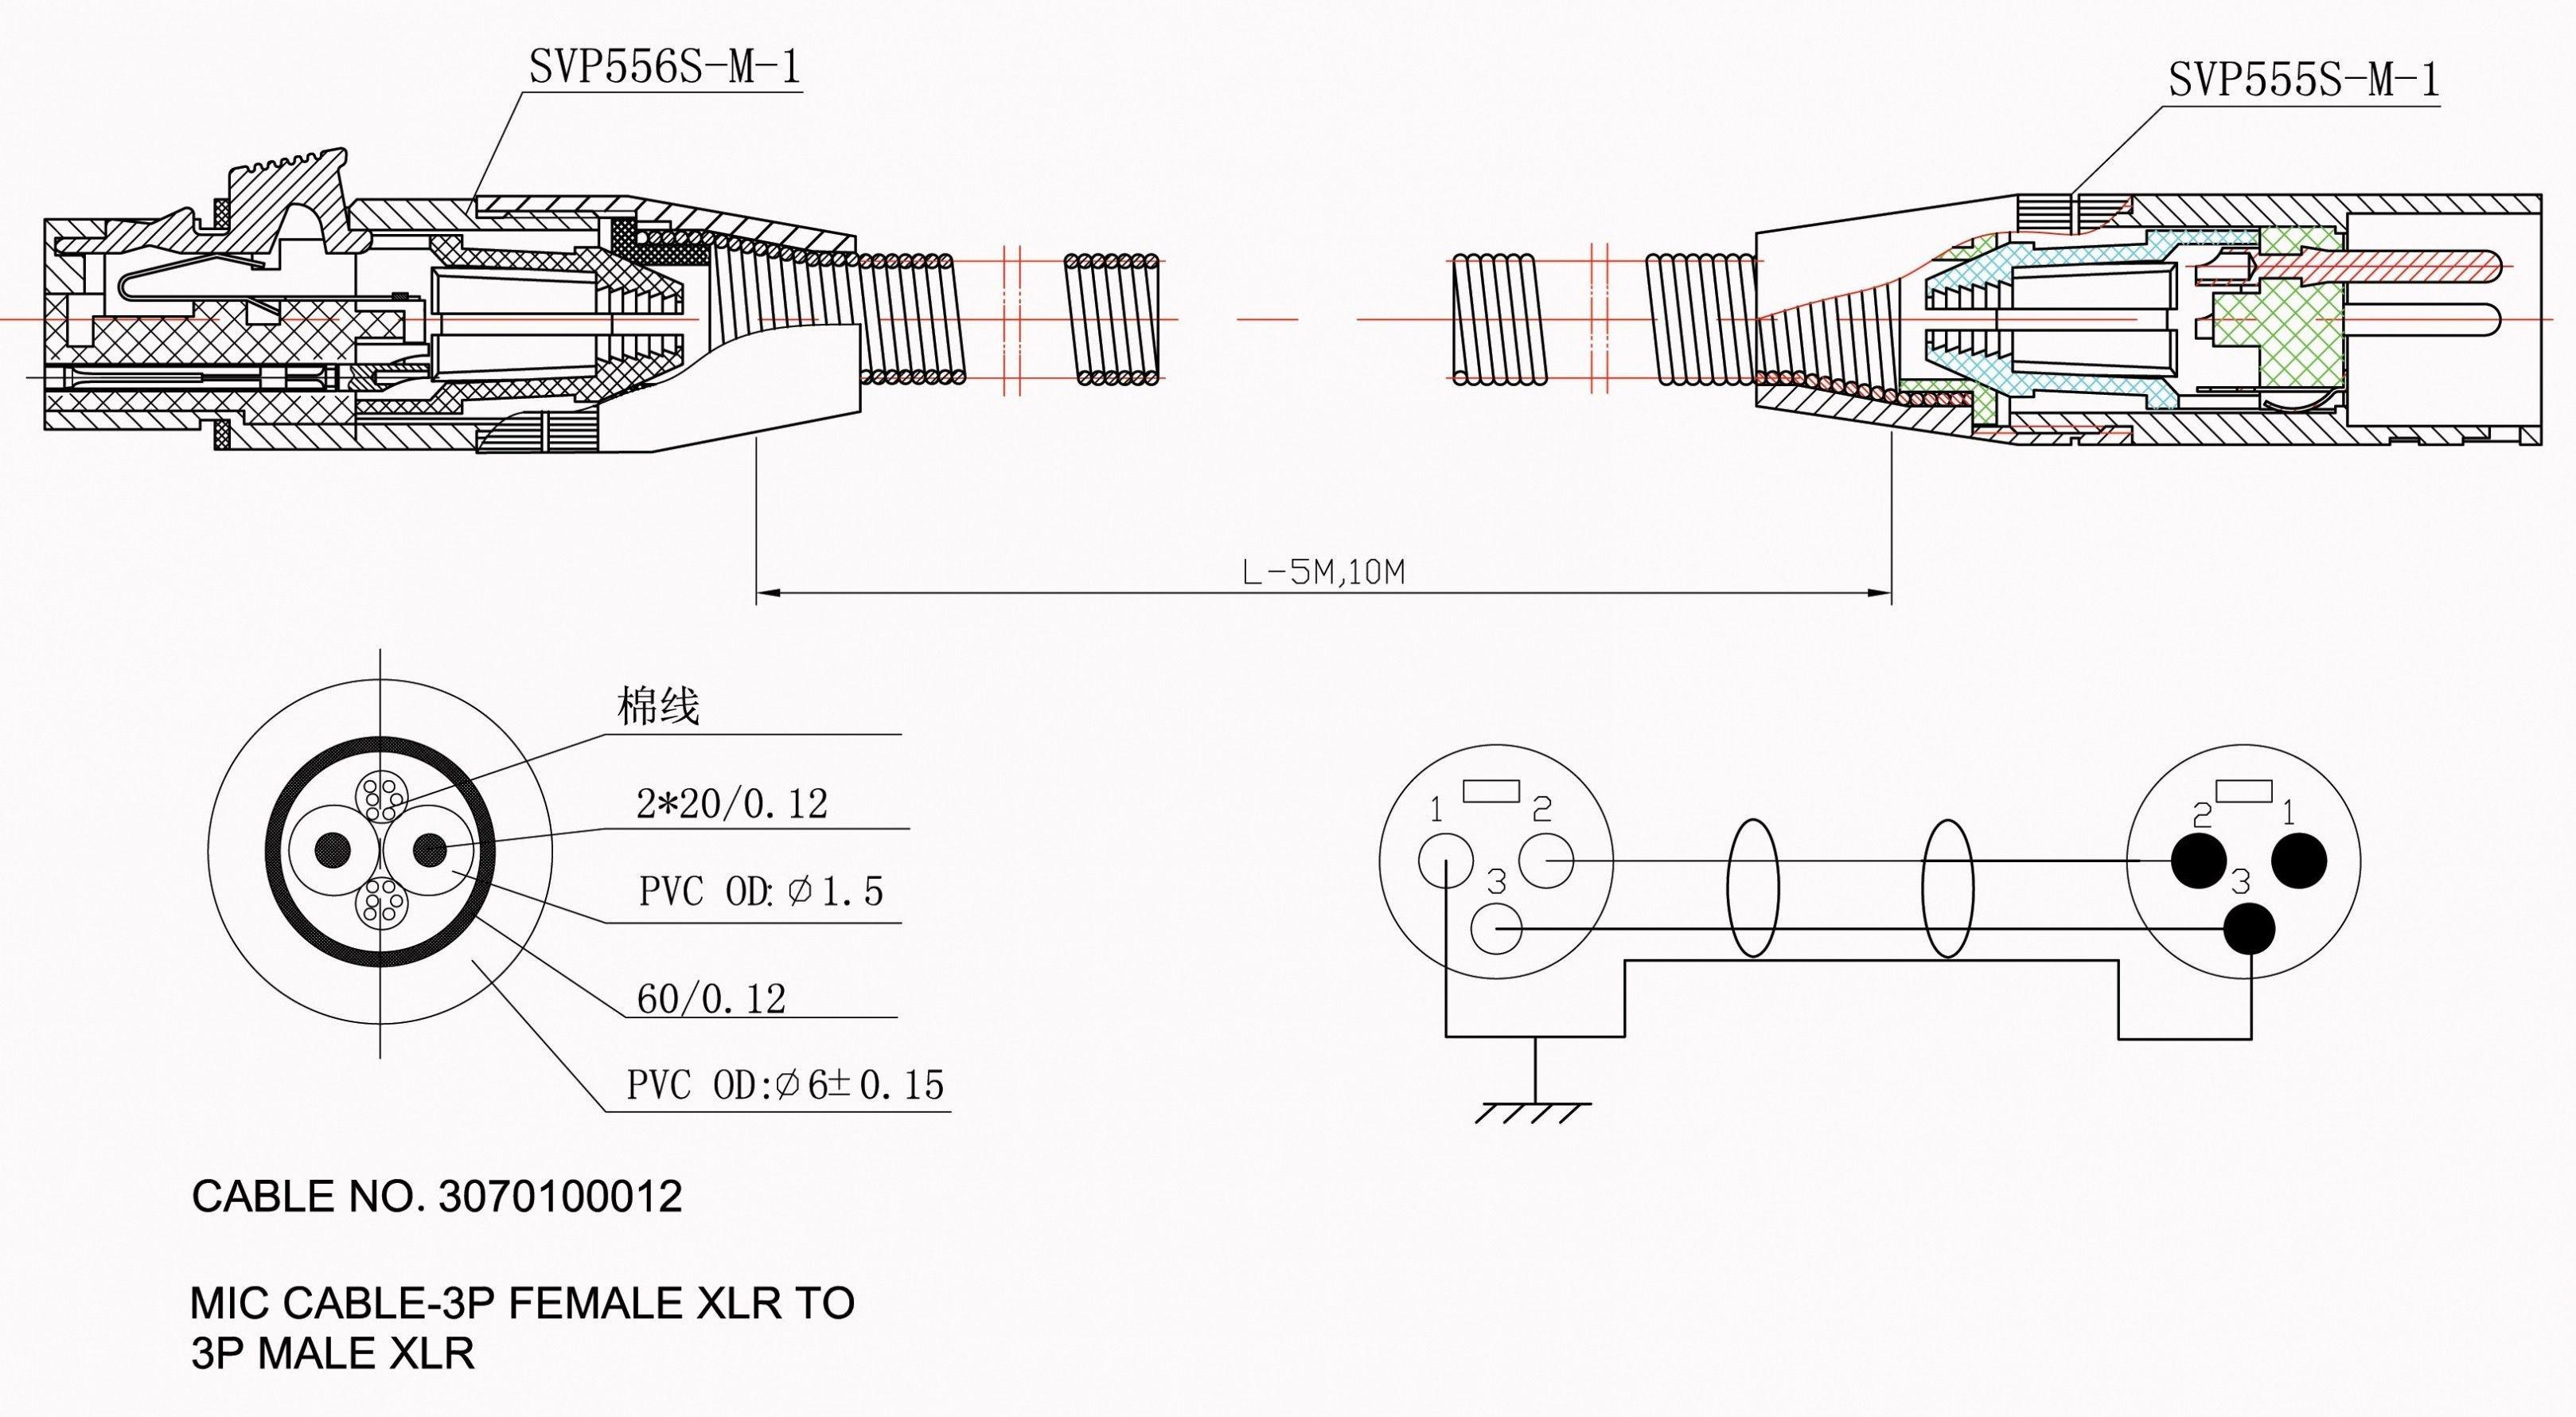 Ford Alternator Wiring Diagrams Best E46 Alternator Wiring Diagram Diagrams Of Ford Alternator Wiring Diagrams